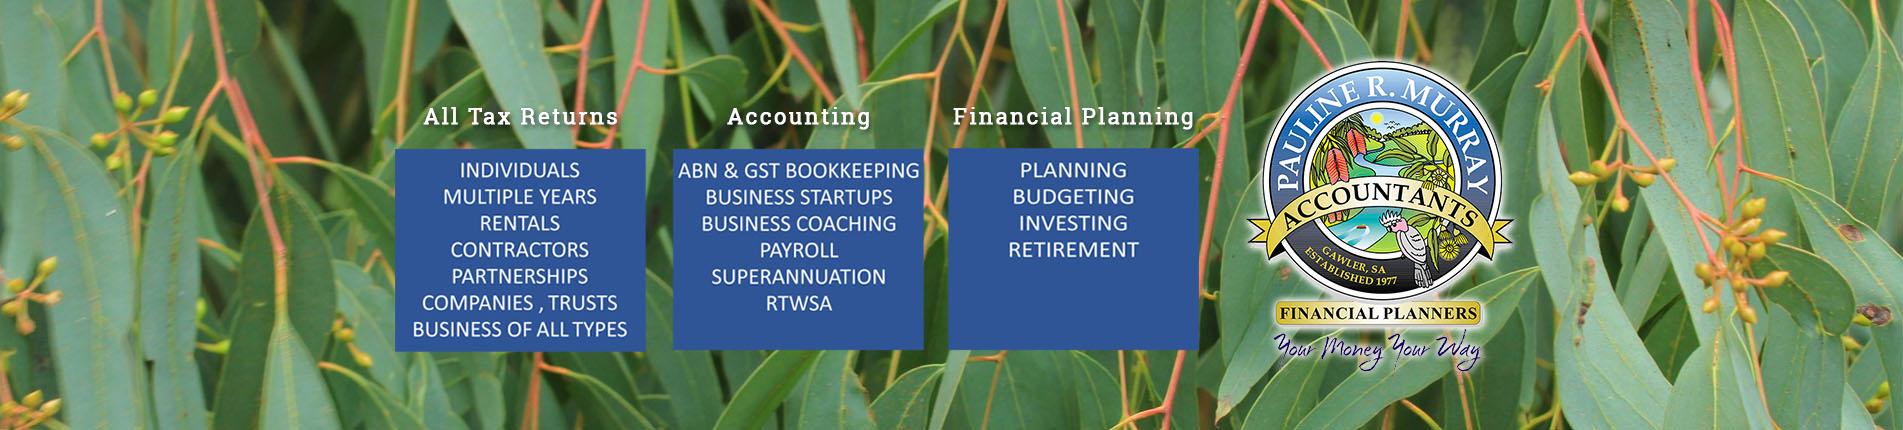 pauline-r-murray-accountant-financial-planner-services-gawler-wallaroo-murray-bridge-pt-pirie